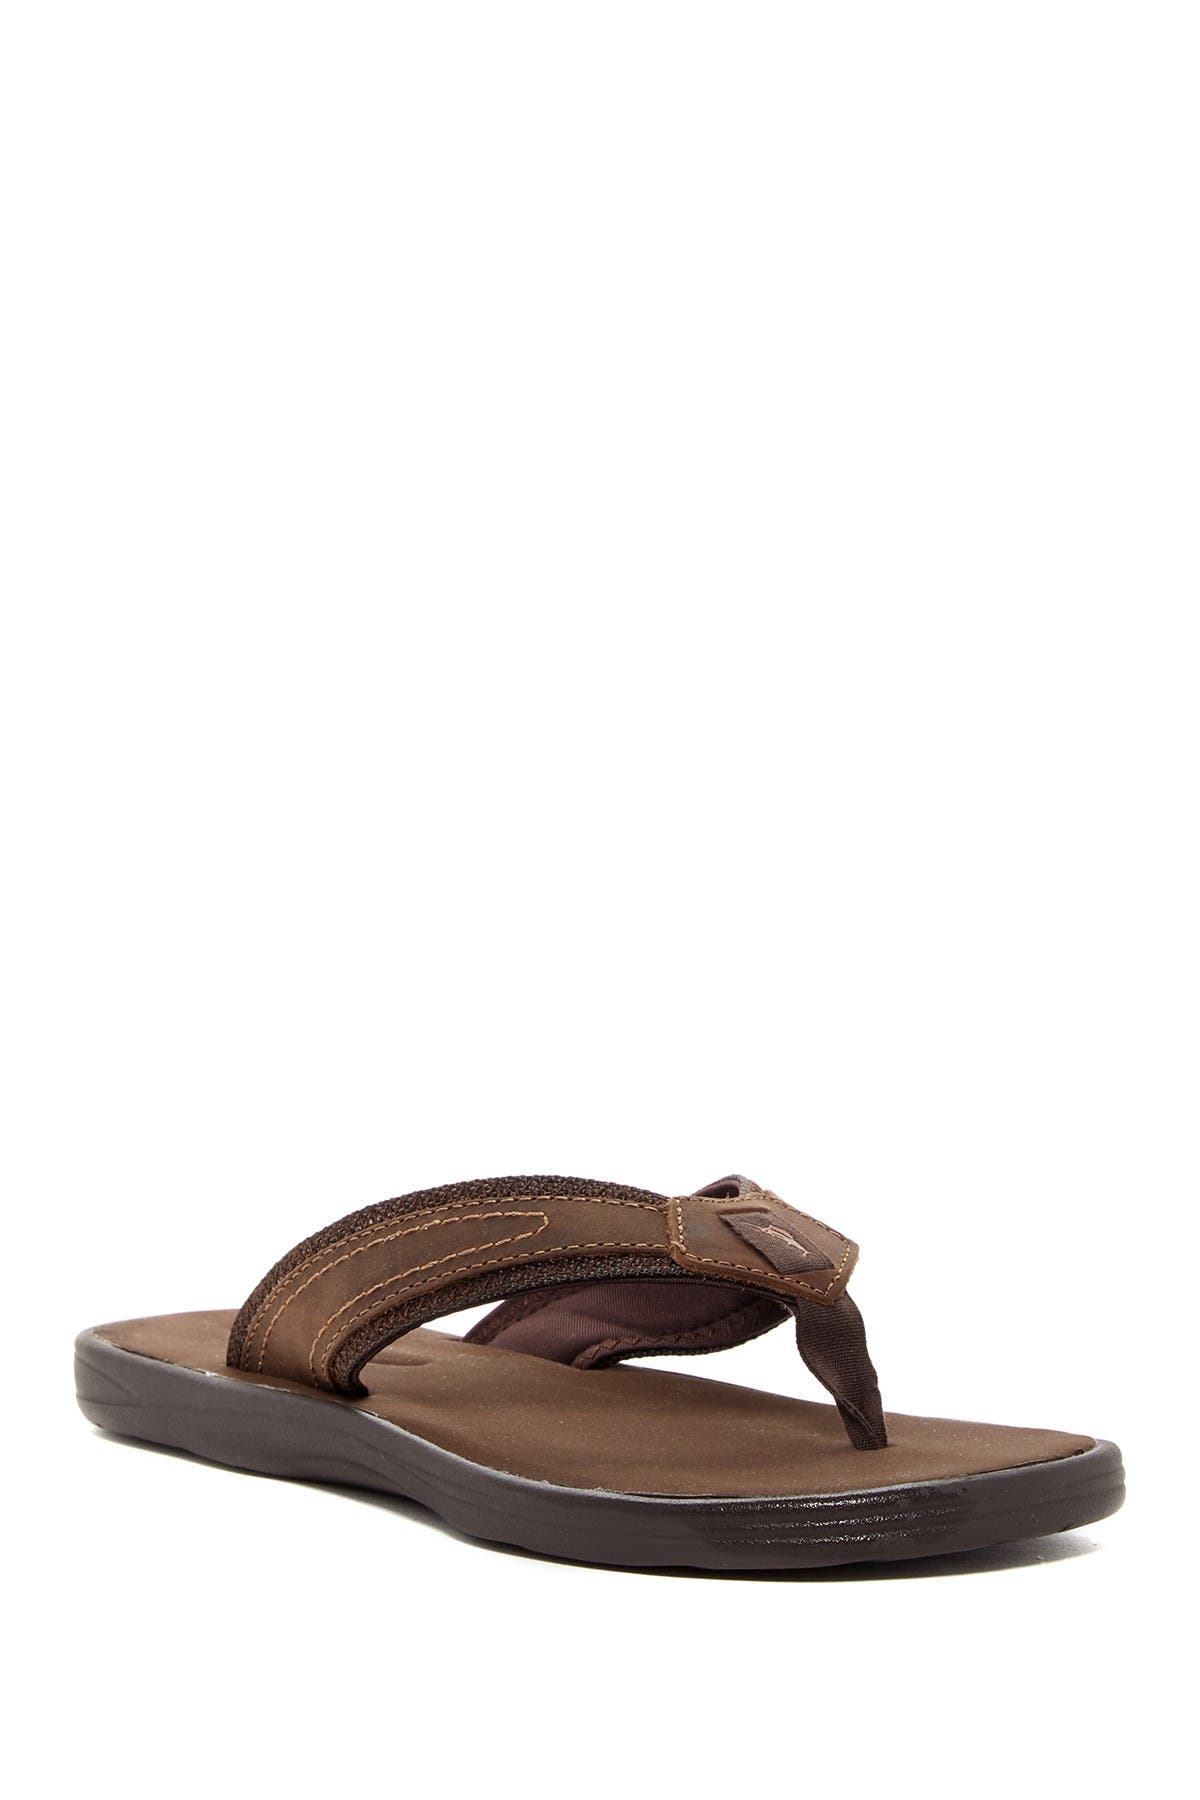 Tommy Bahama   Sumatraa Leather Flip